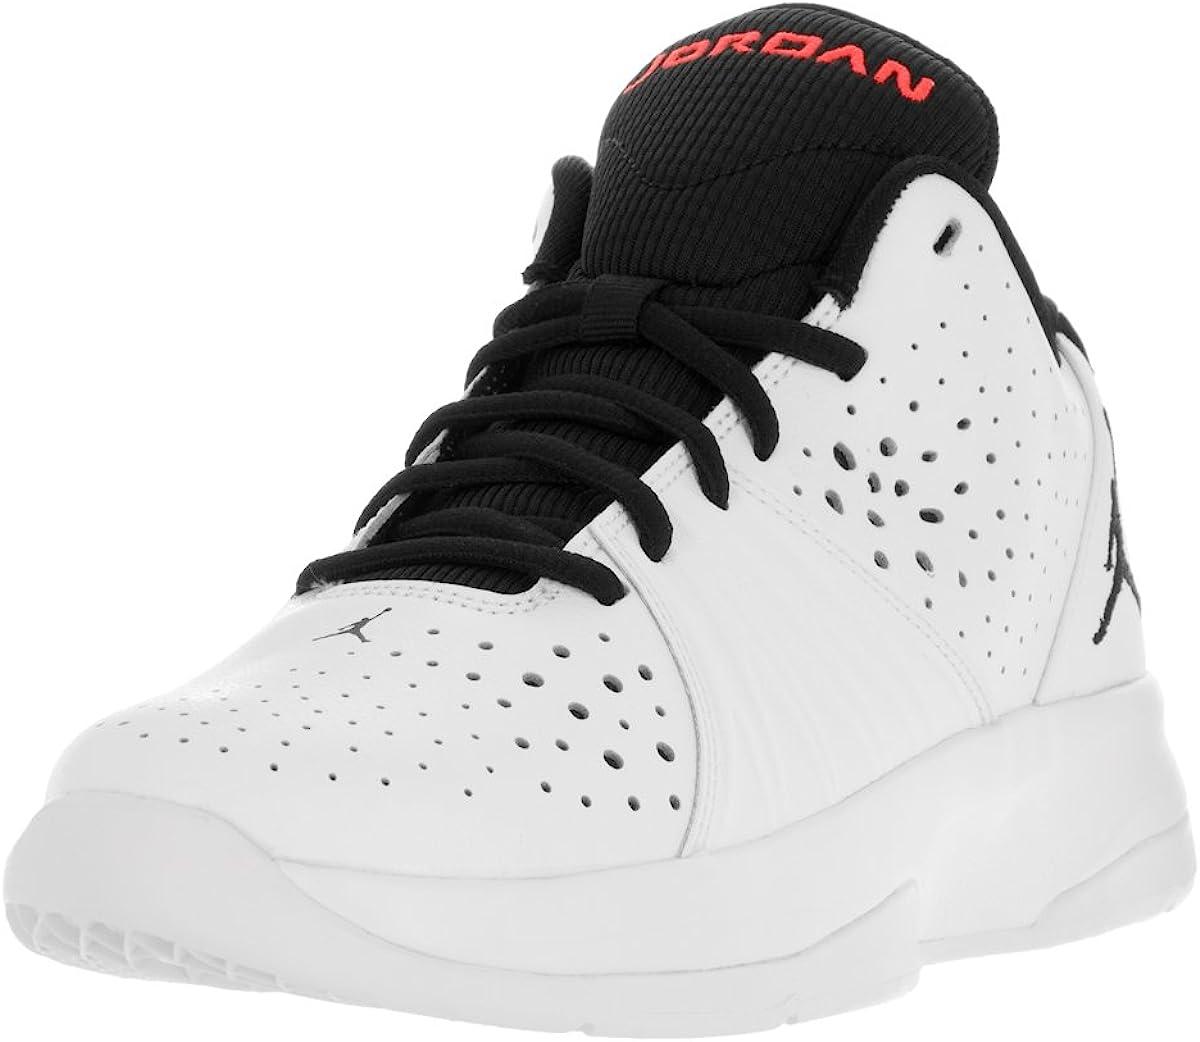 Nike Jordan Kids Jordan 5 AM BG White